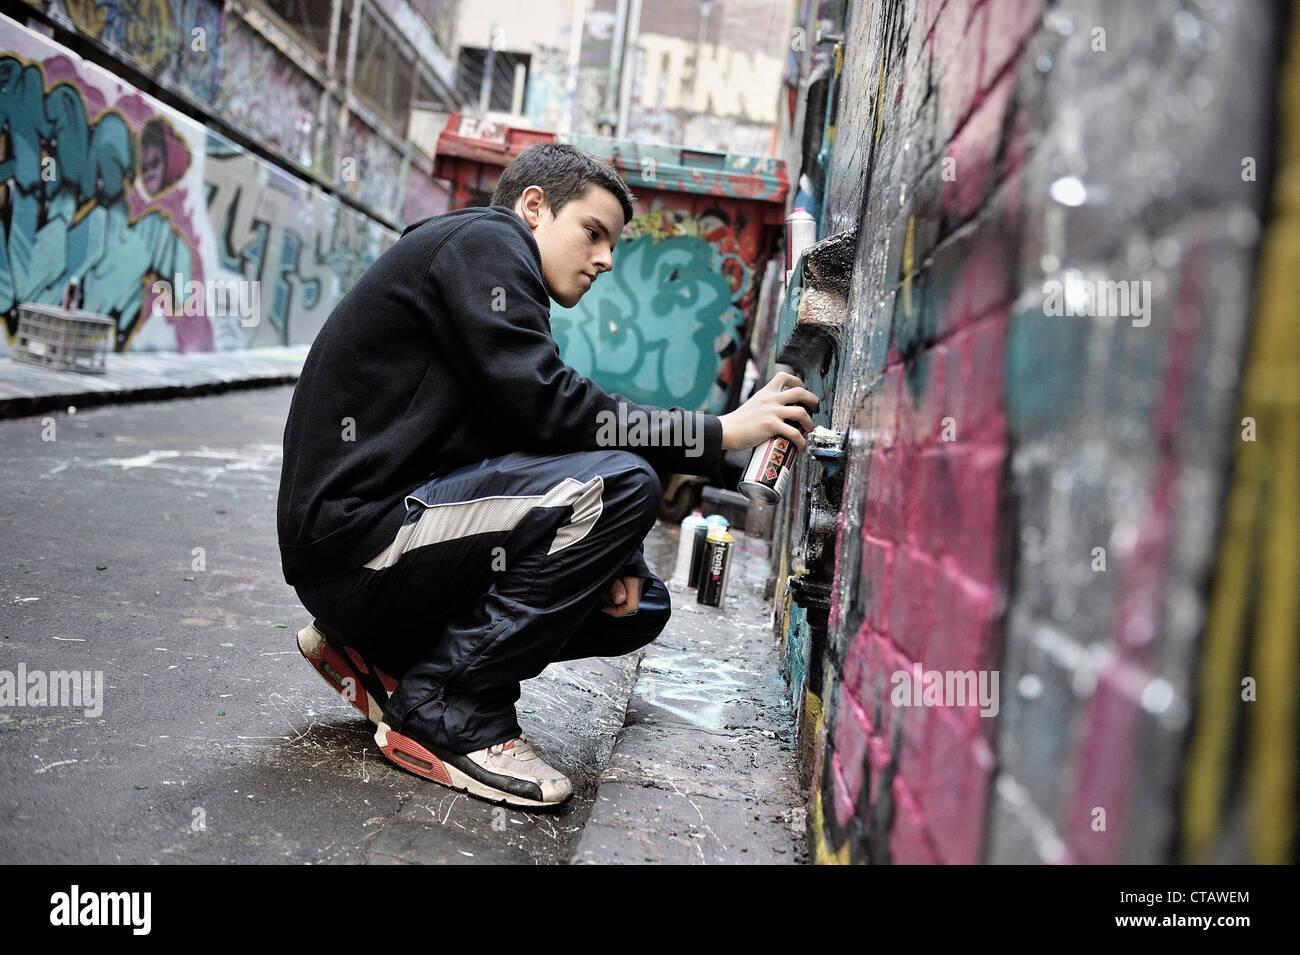 Young graffiti artist, sreet art, Melbourne, Victoria, Australien - Stock Image